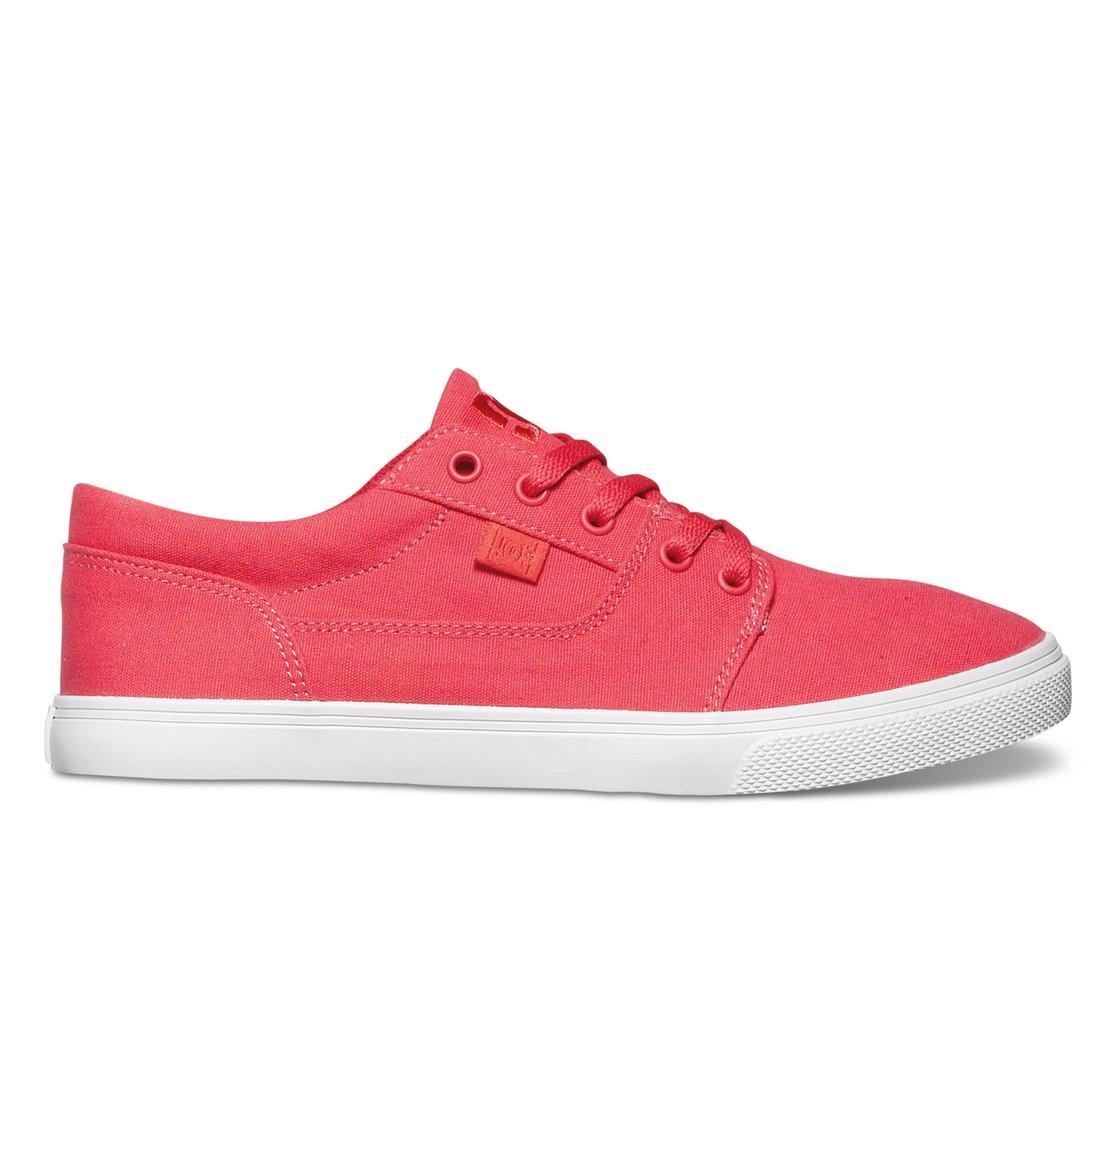 Tonik Tx Low Top W Schuhe Shoes Adjs300069Dc qpUGzMSV